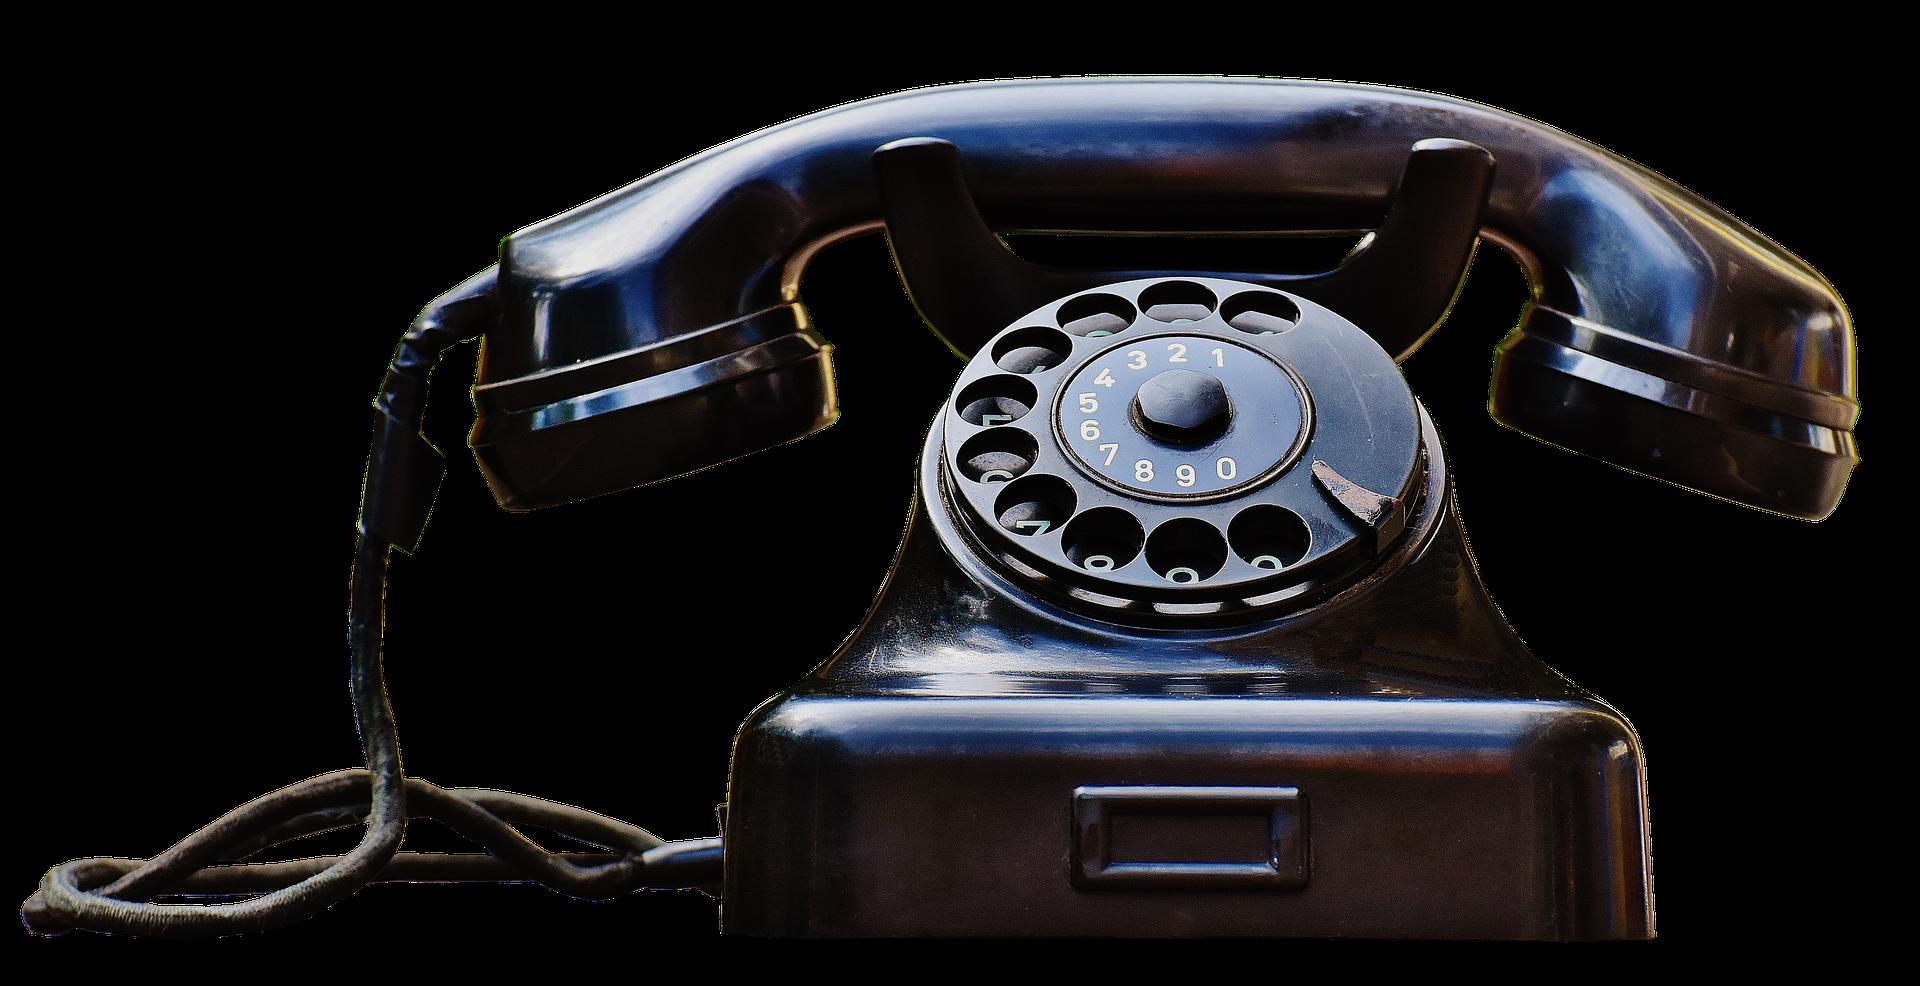 phone-2476595_1920.png